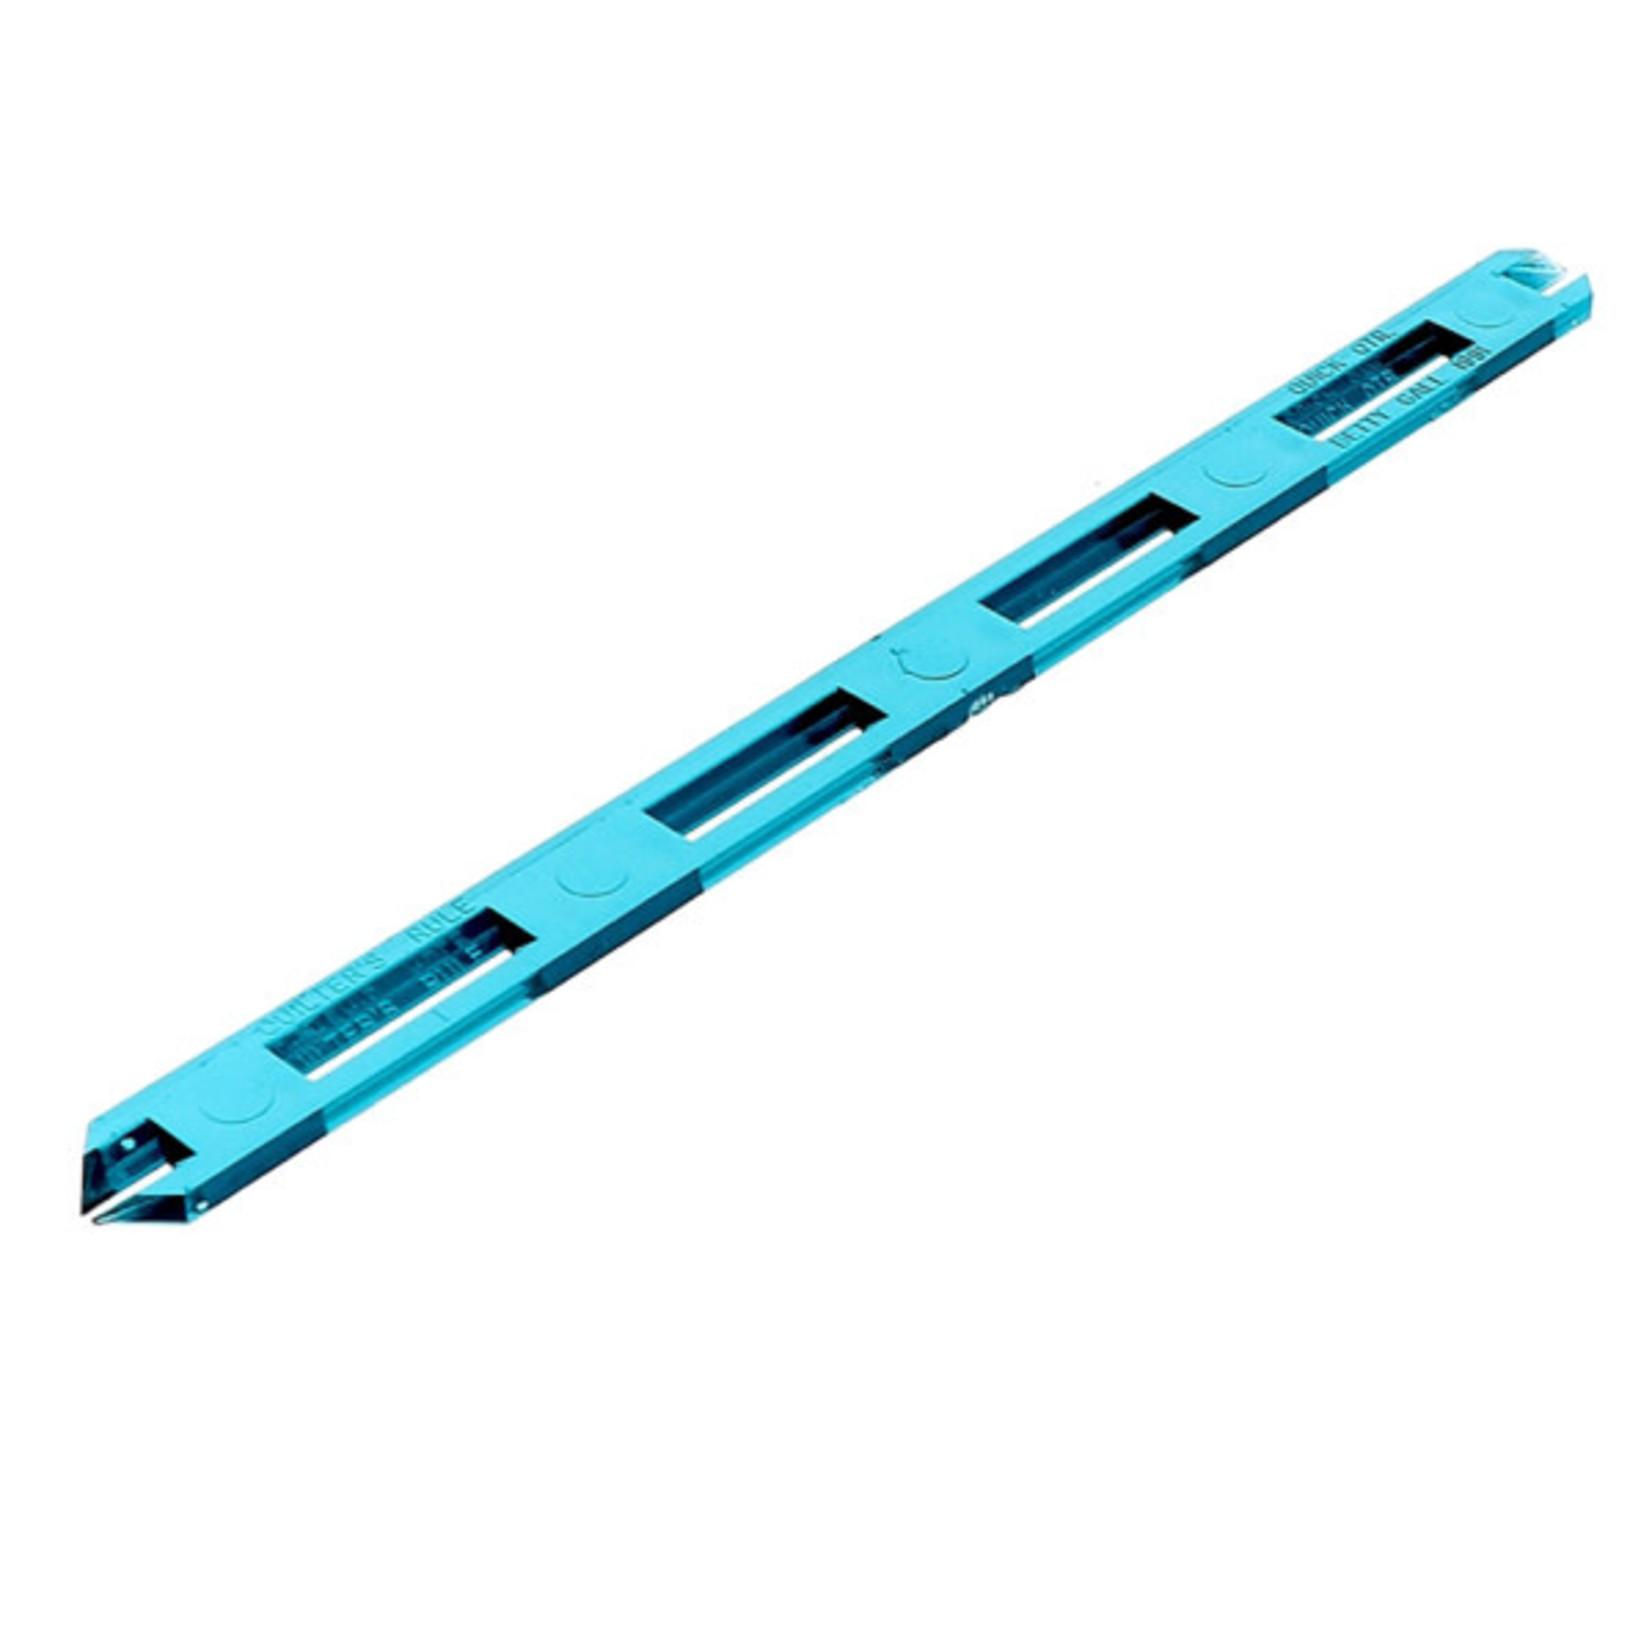 Bohin Liniaal - 1/4inch afmeten - 20cm